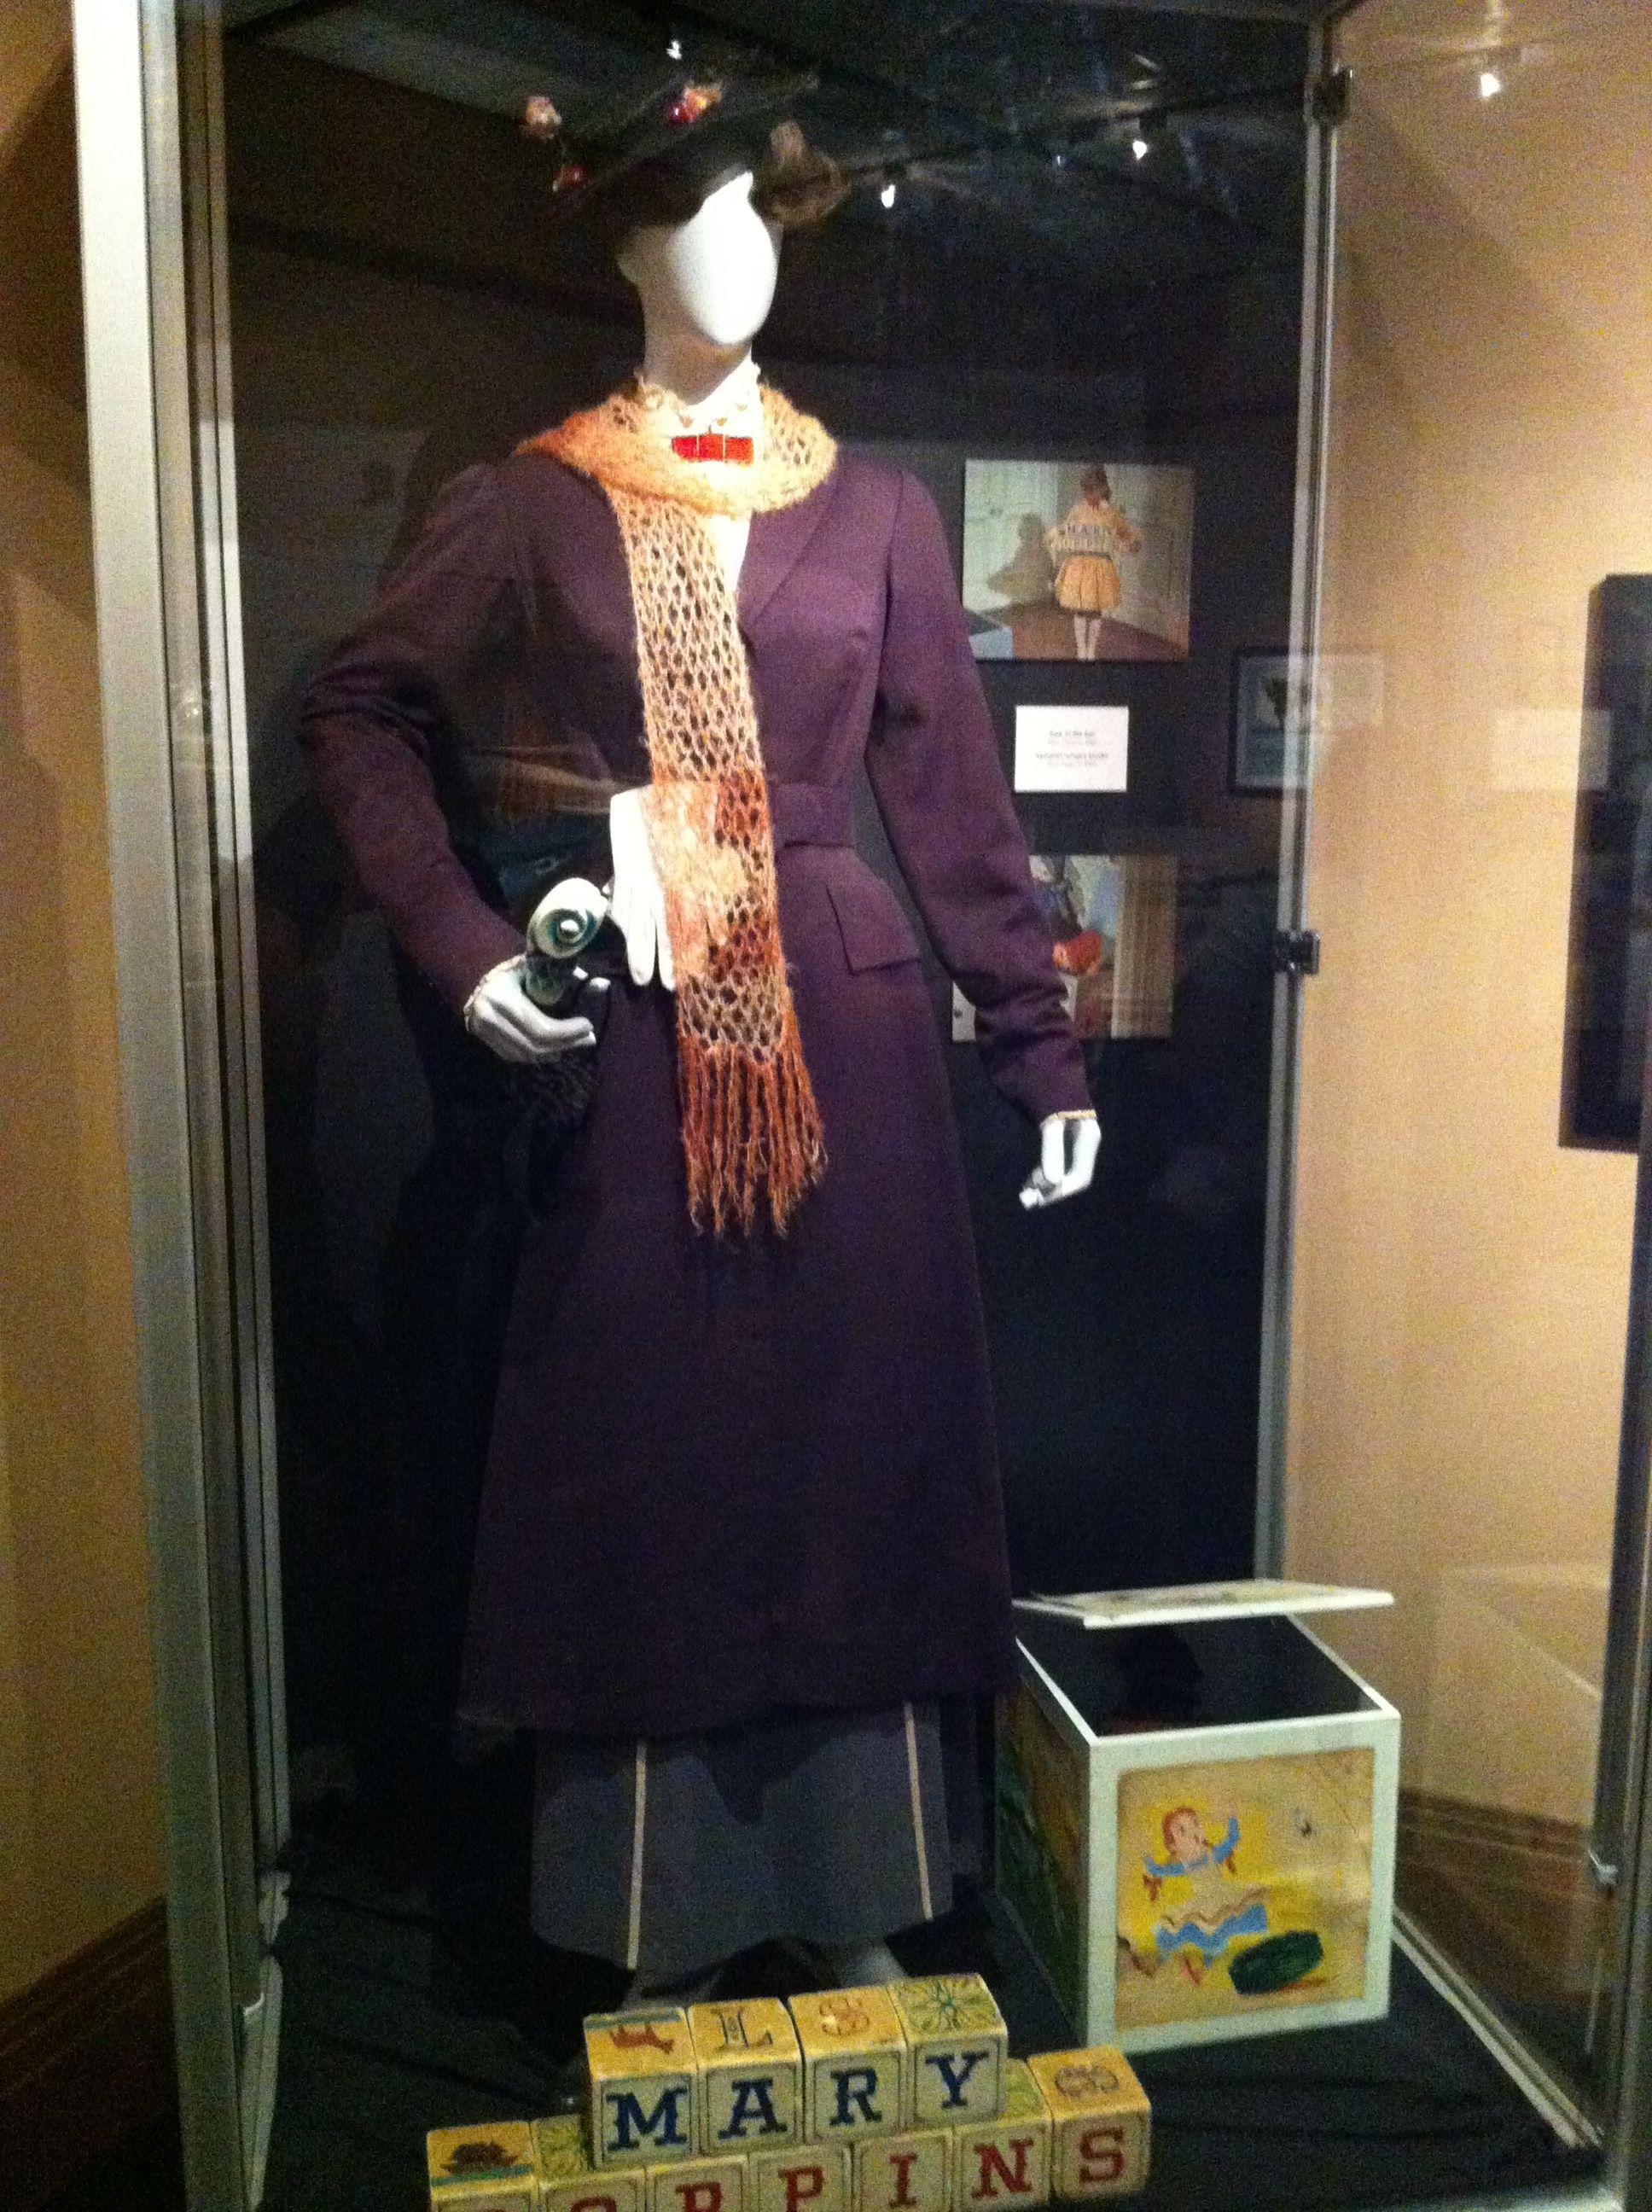 Original Mary Poppins costume worn by Julie Andrews